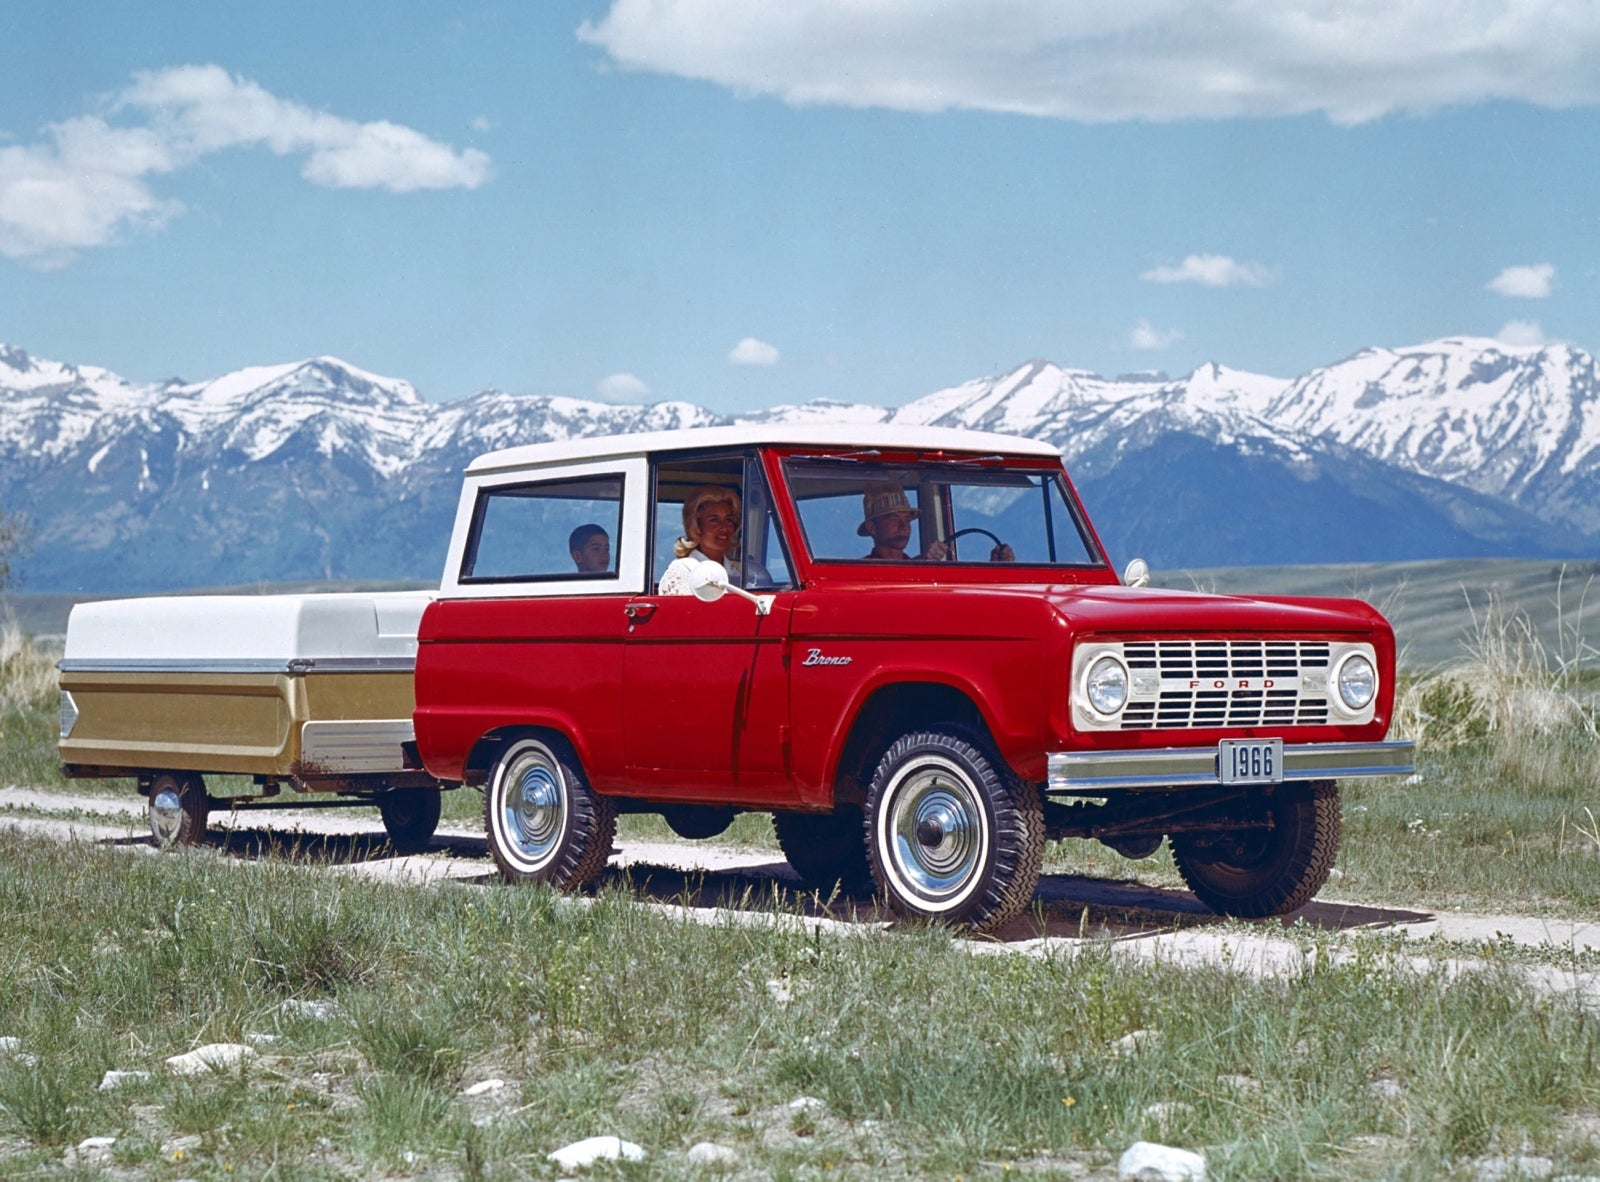 Brand New 1966 Ford Bronco Bodies Debuting At SEMA